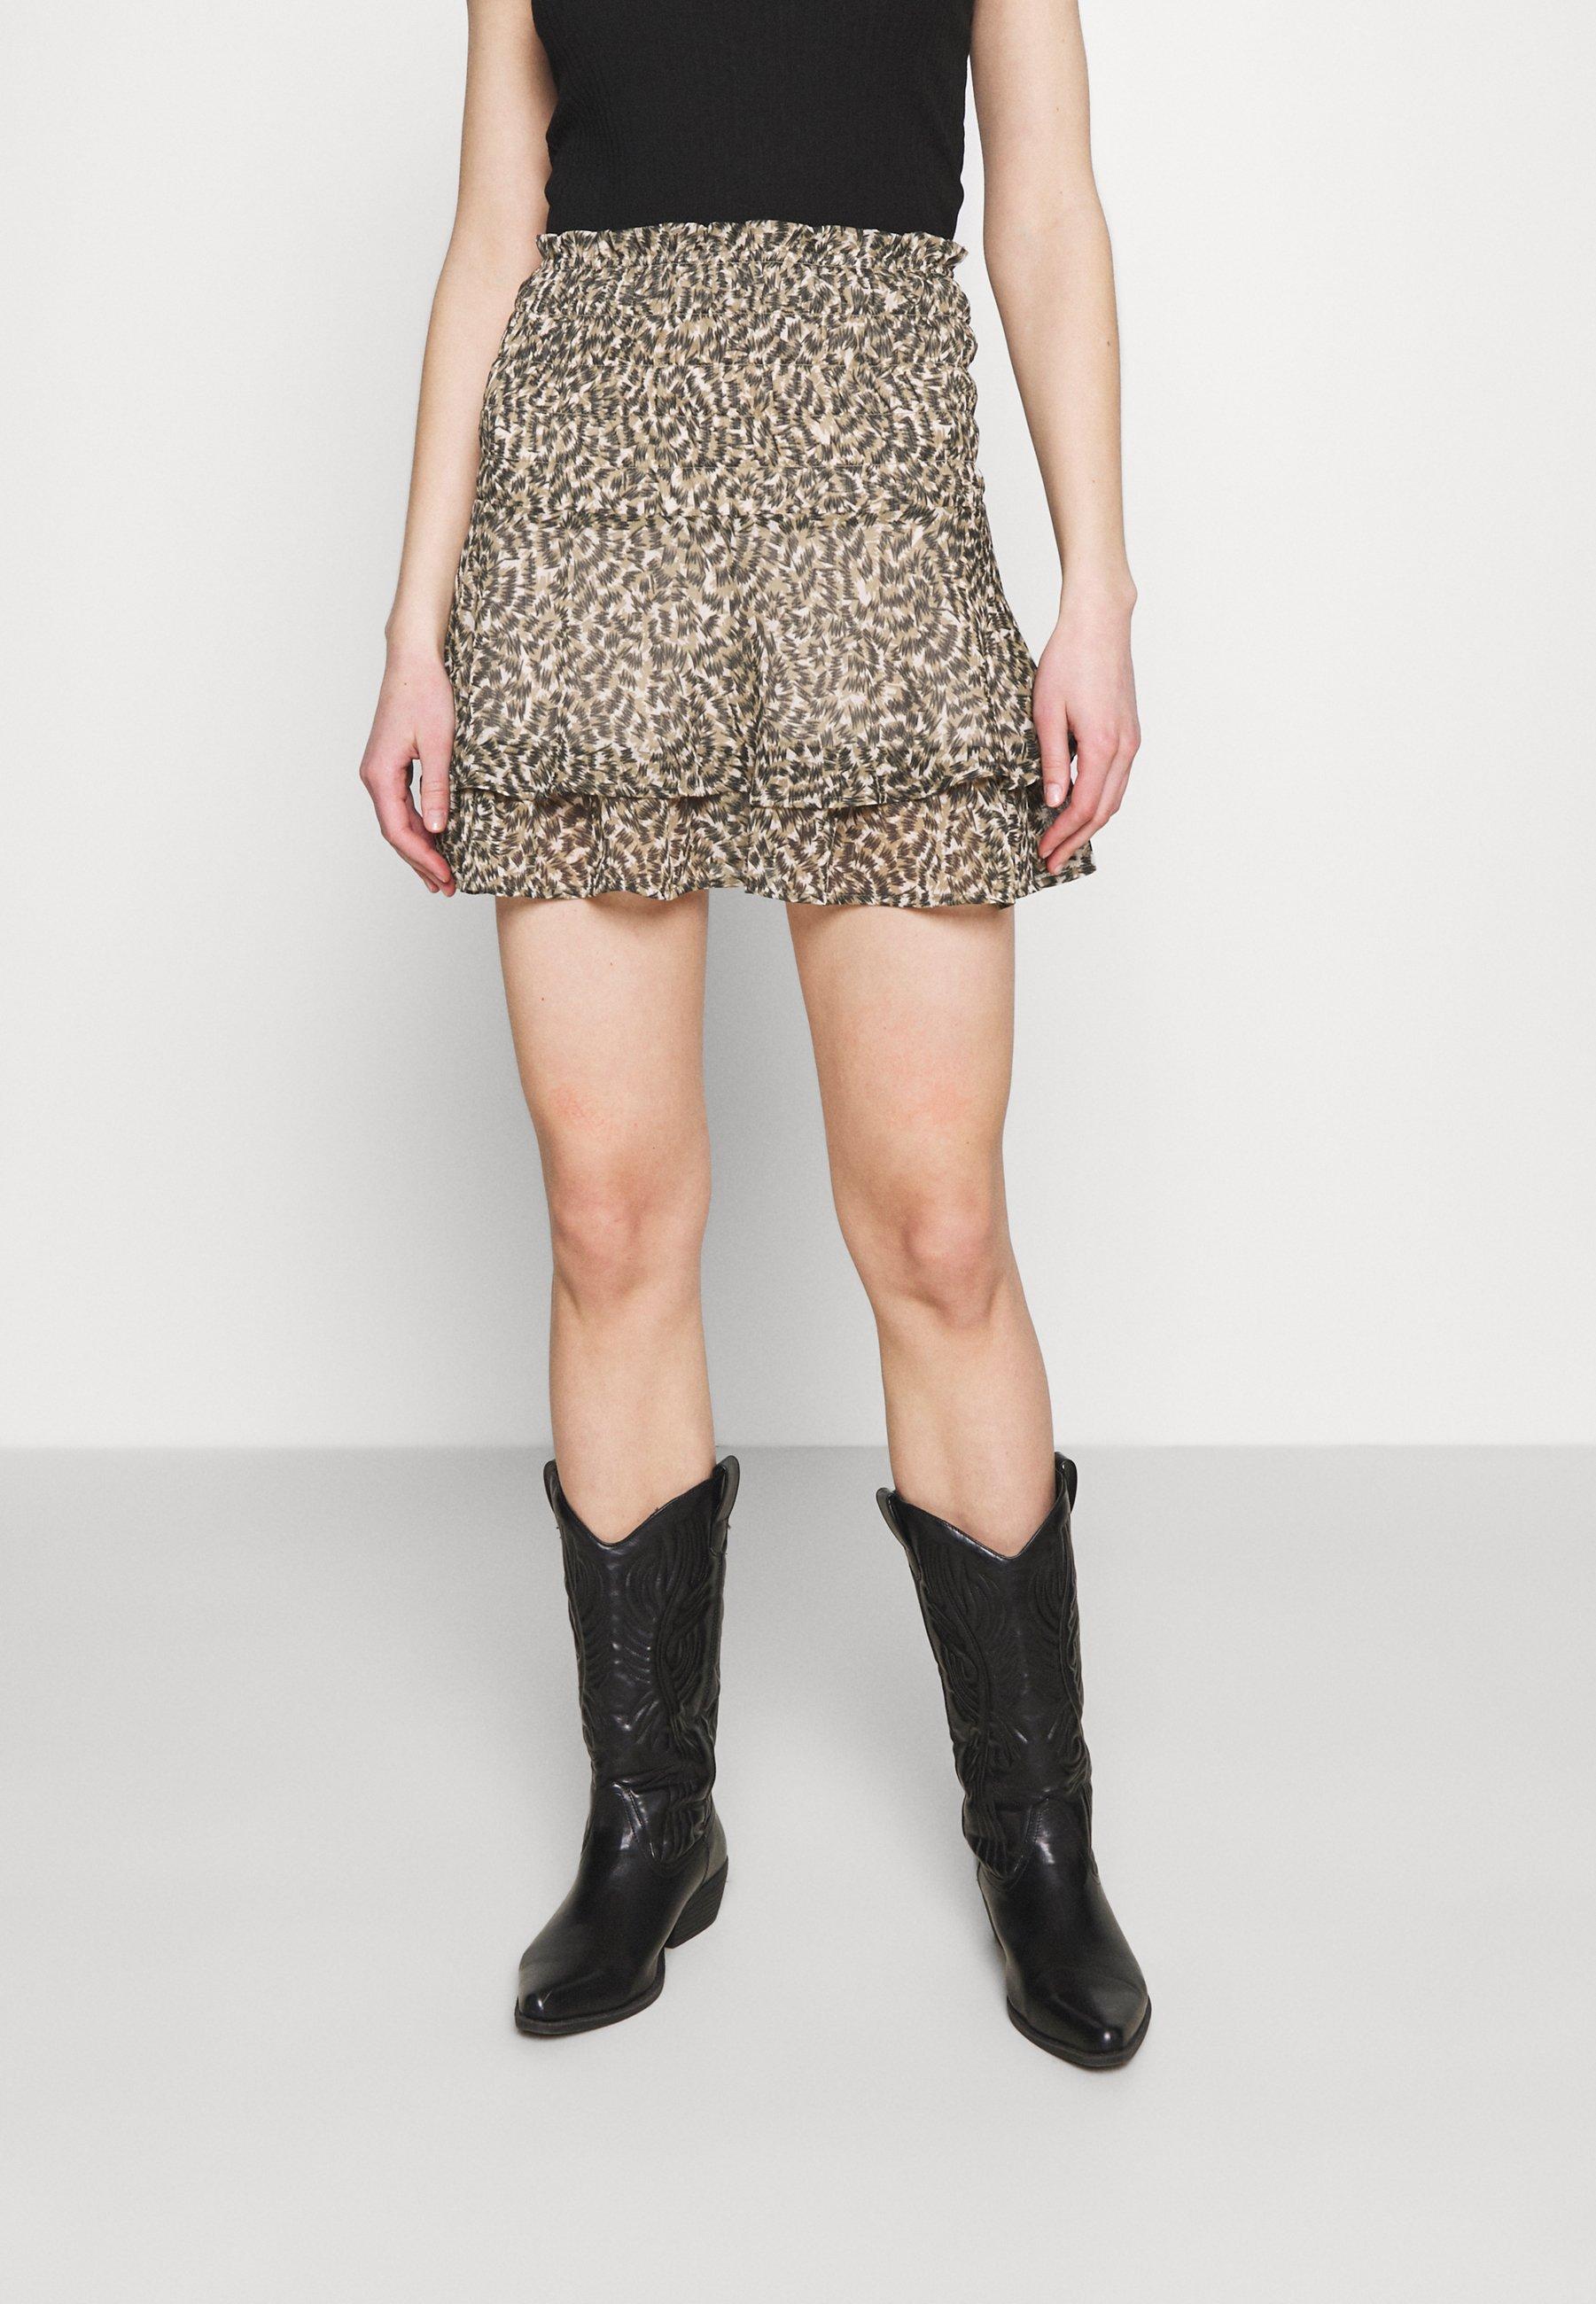 Femme ONLMARGUERITE SKIRT - Minijupe